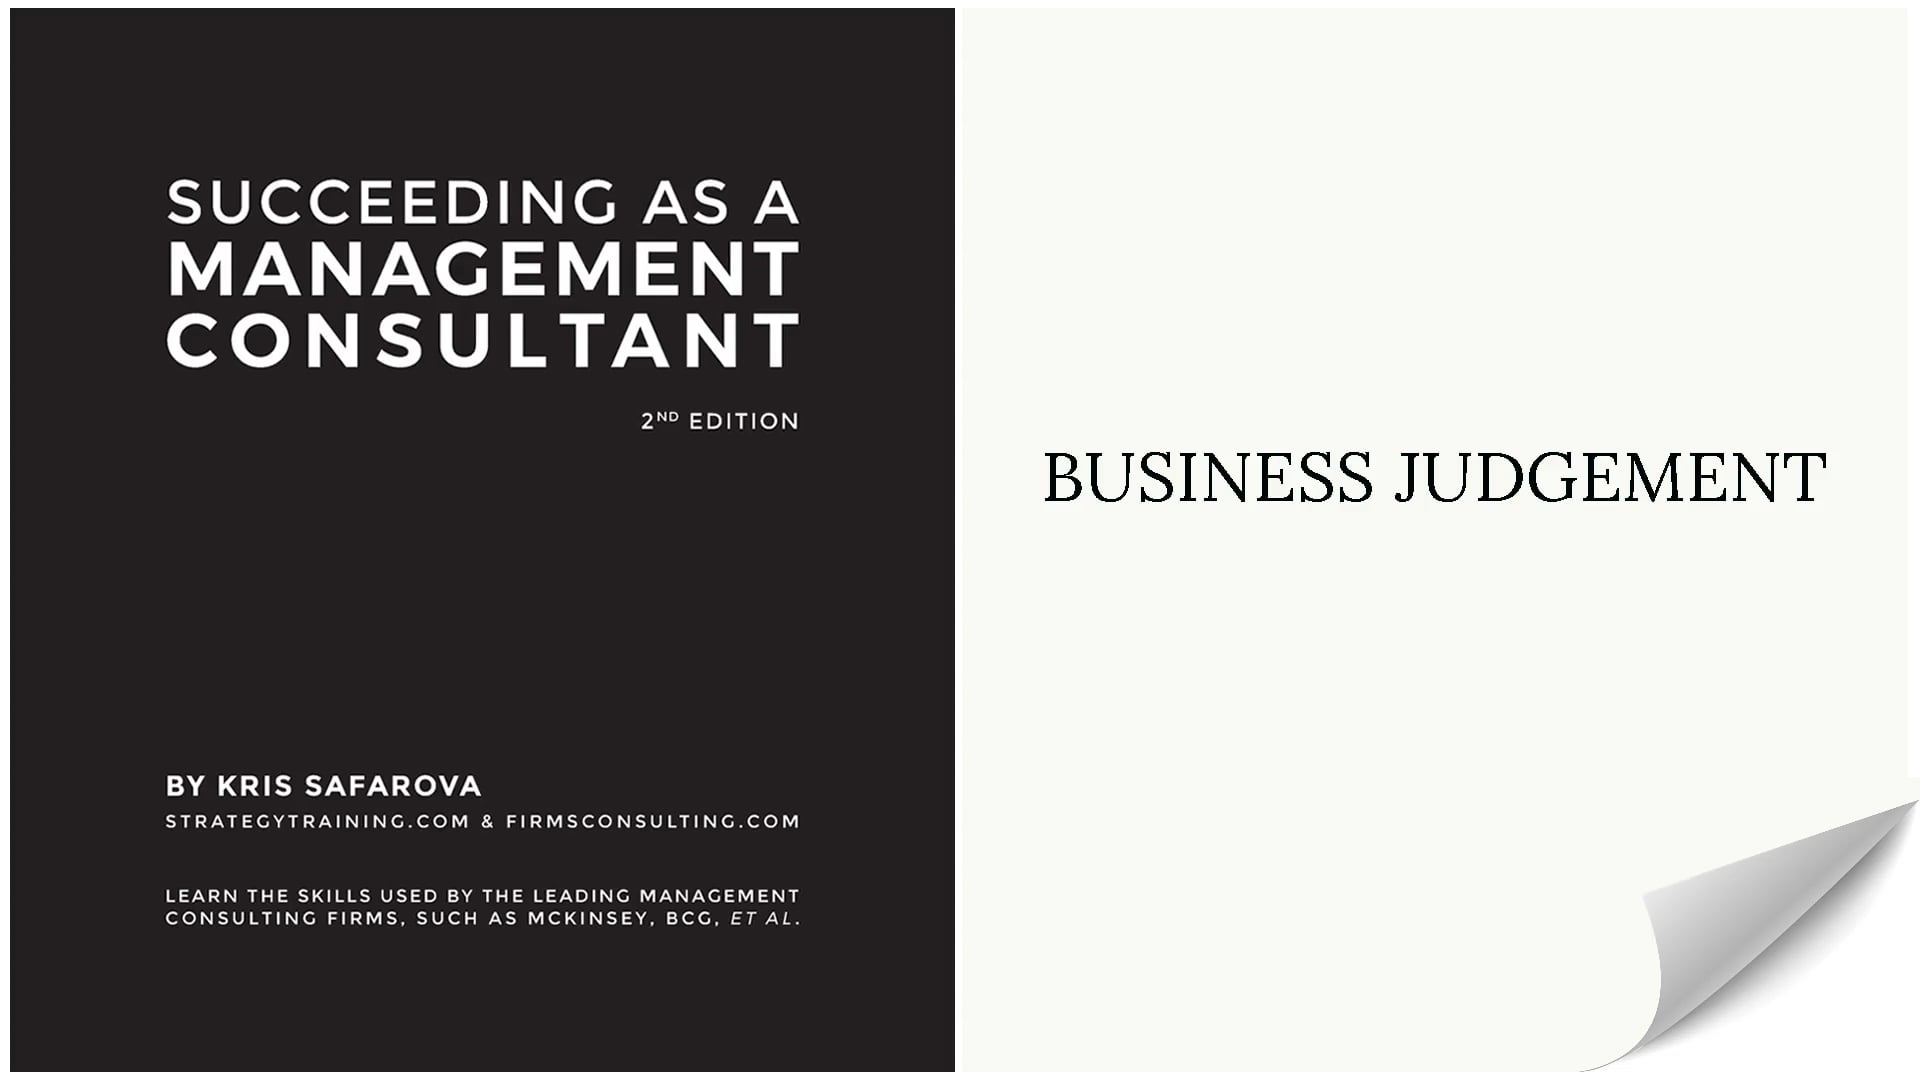 004 SAAMC Business Judgement